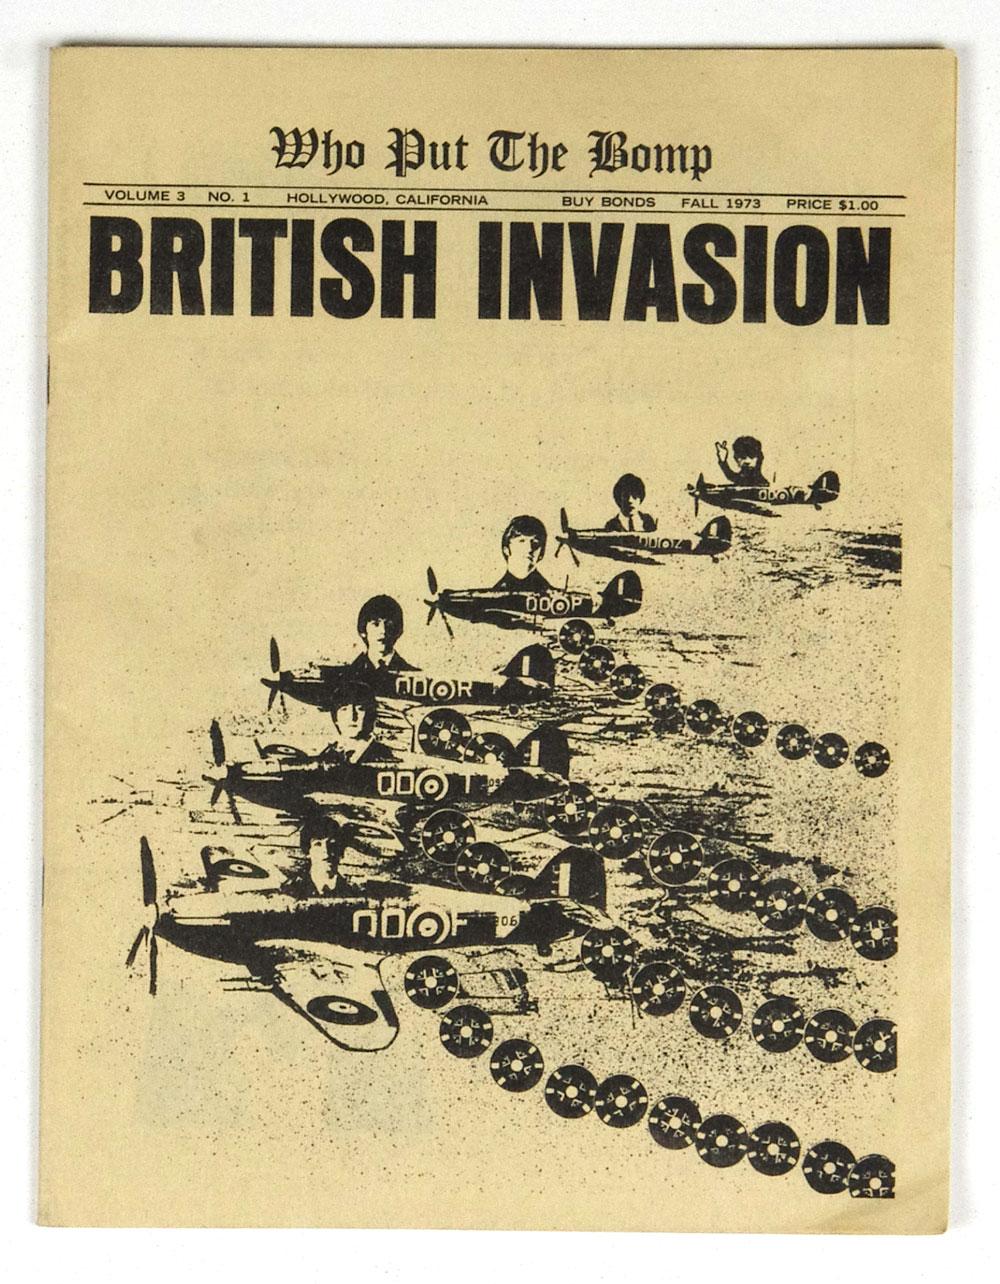 The Beatles Magazine Who Put The Bomb British Invasion 1973 Fall Greg Shaw